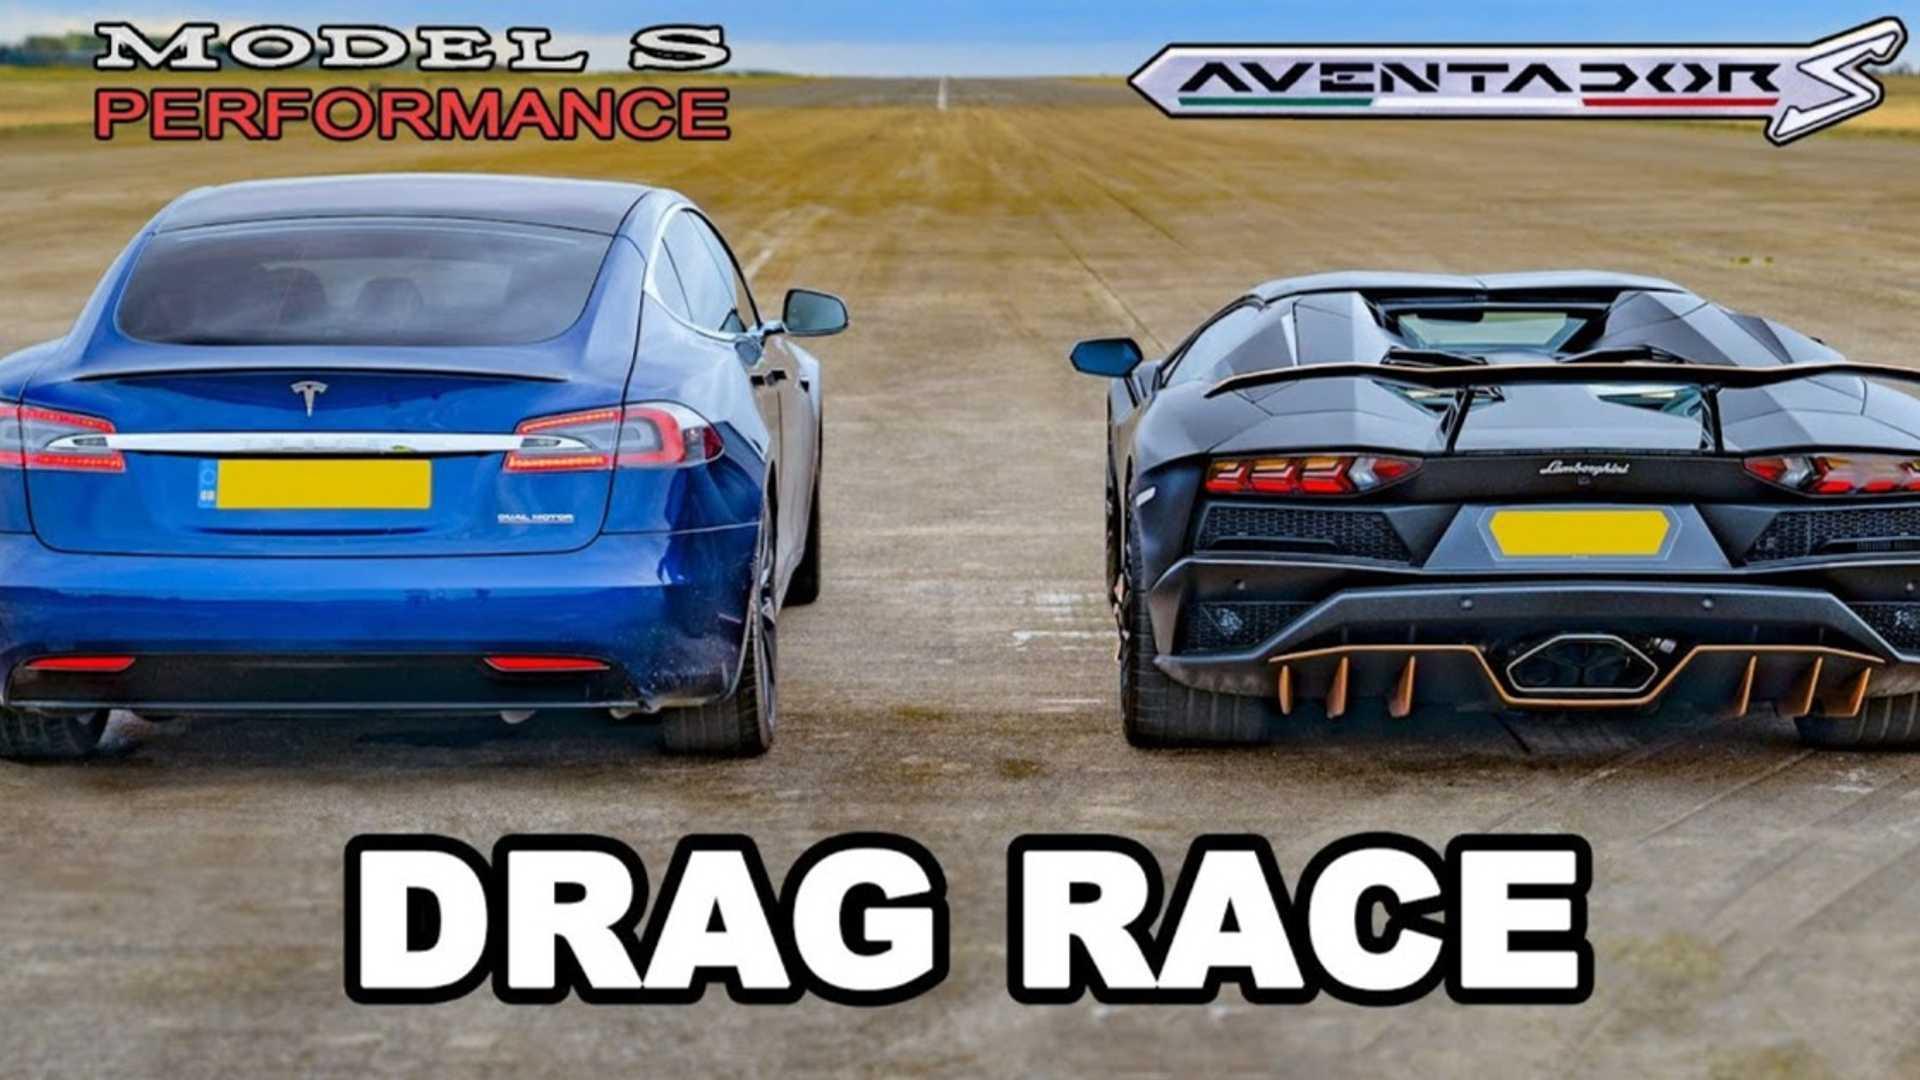 Lamborghini Aventador S Roadster vs. nowa Tesla Model S Performance